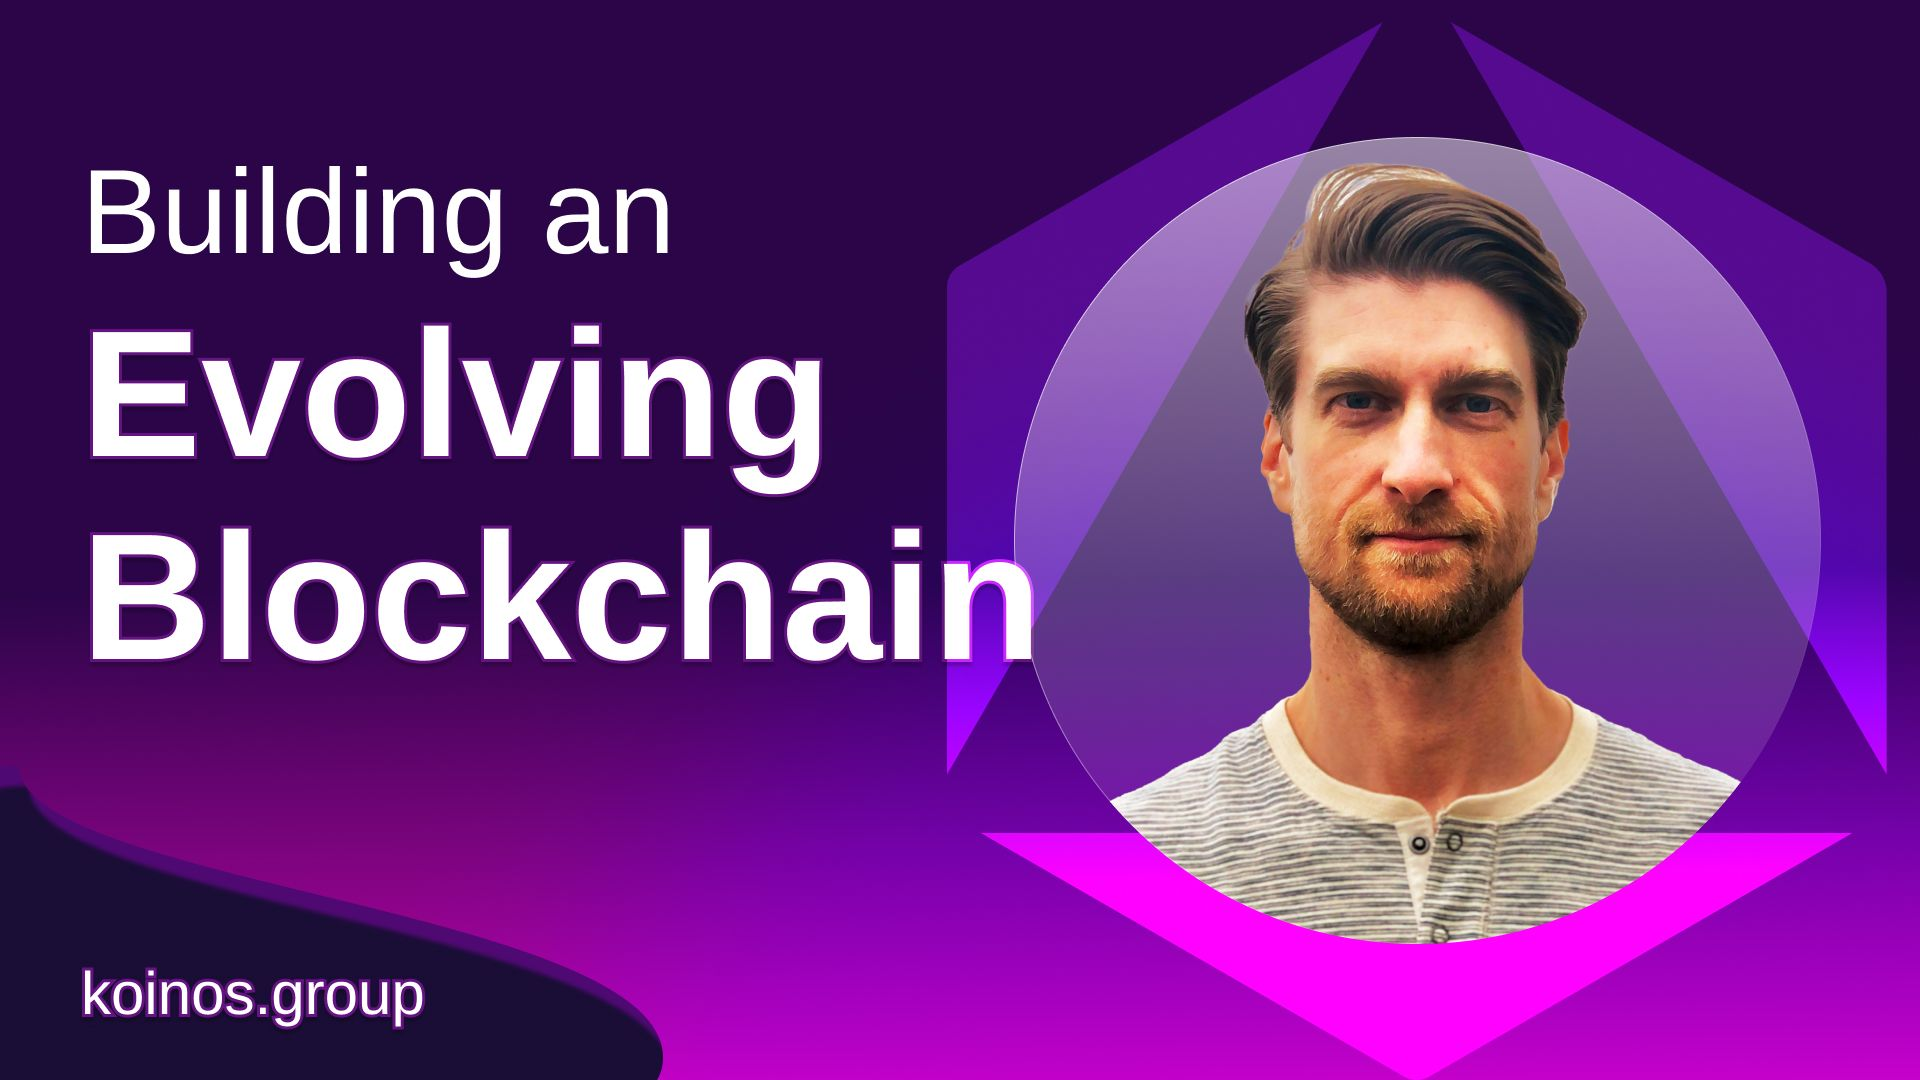 /how-were-building-an-evolving-blockchain-9z1b34p2 feature image